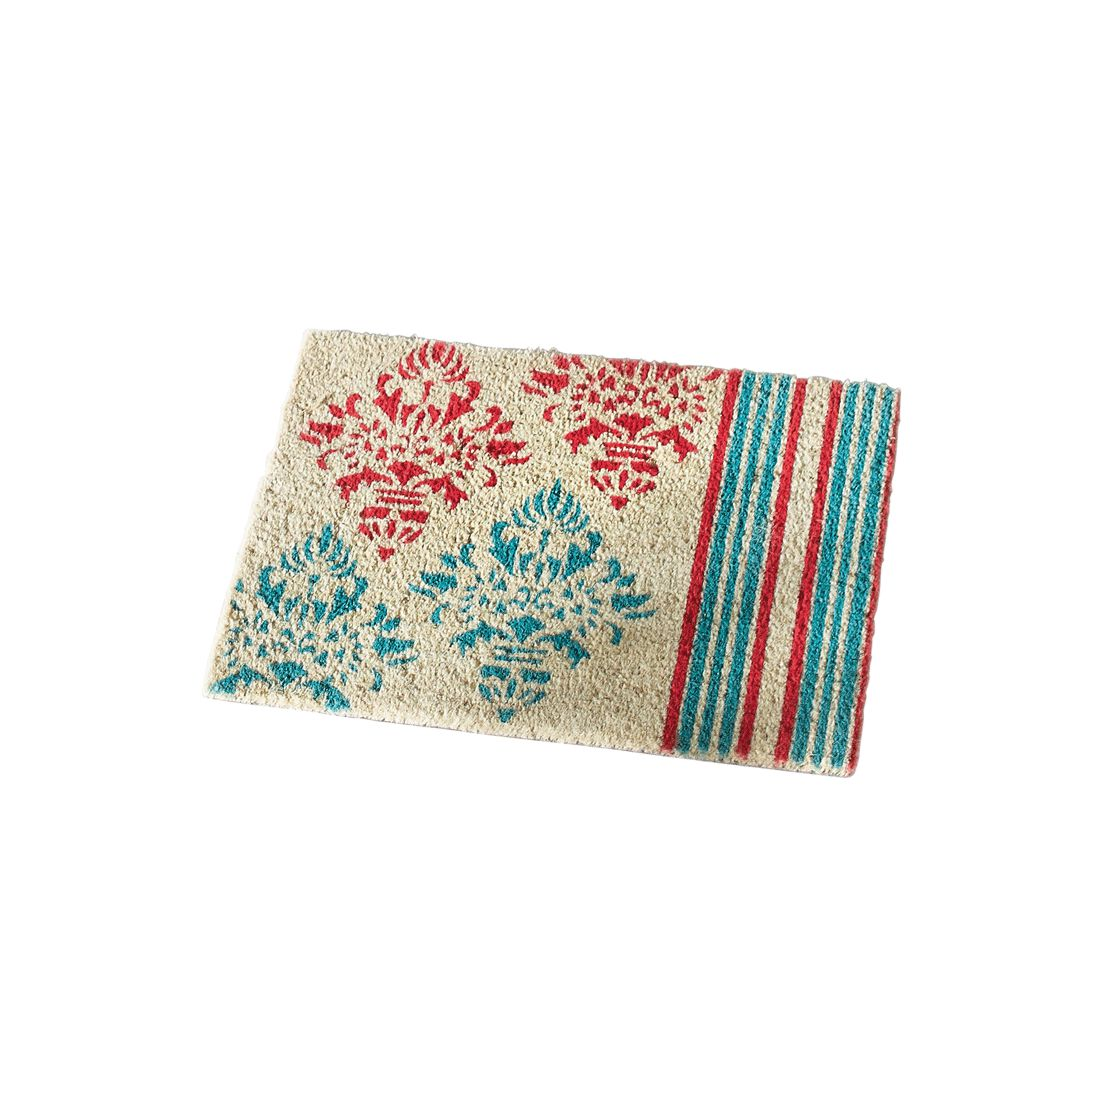 Fußmatte Ornament – Kokos/PVC – Bunt, PureDay online kaufen